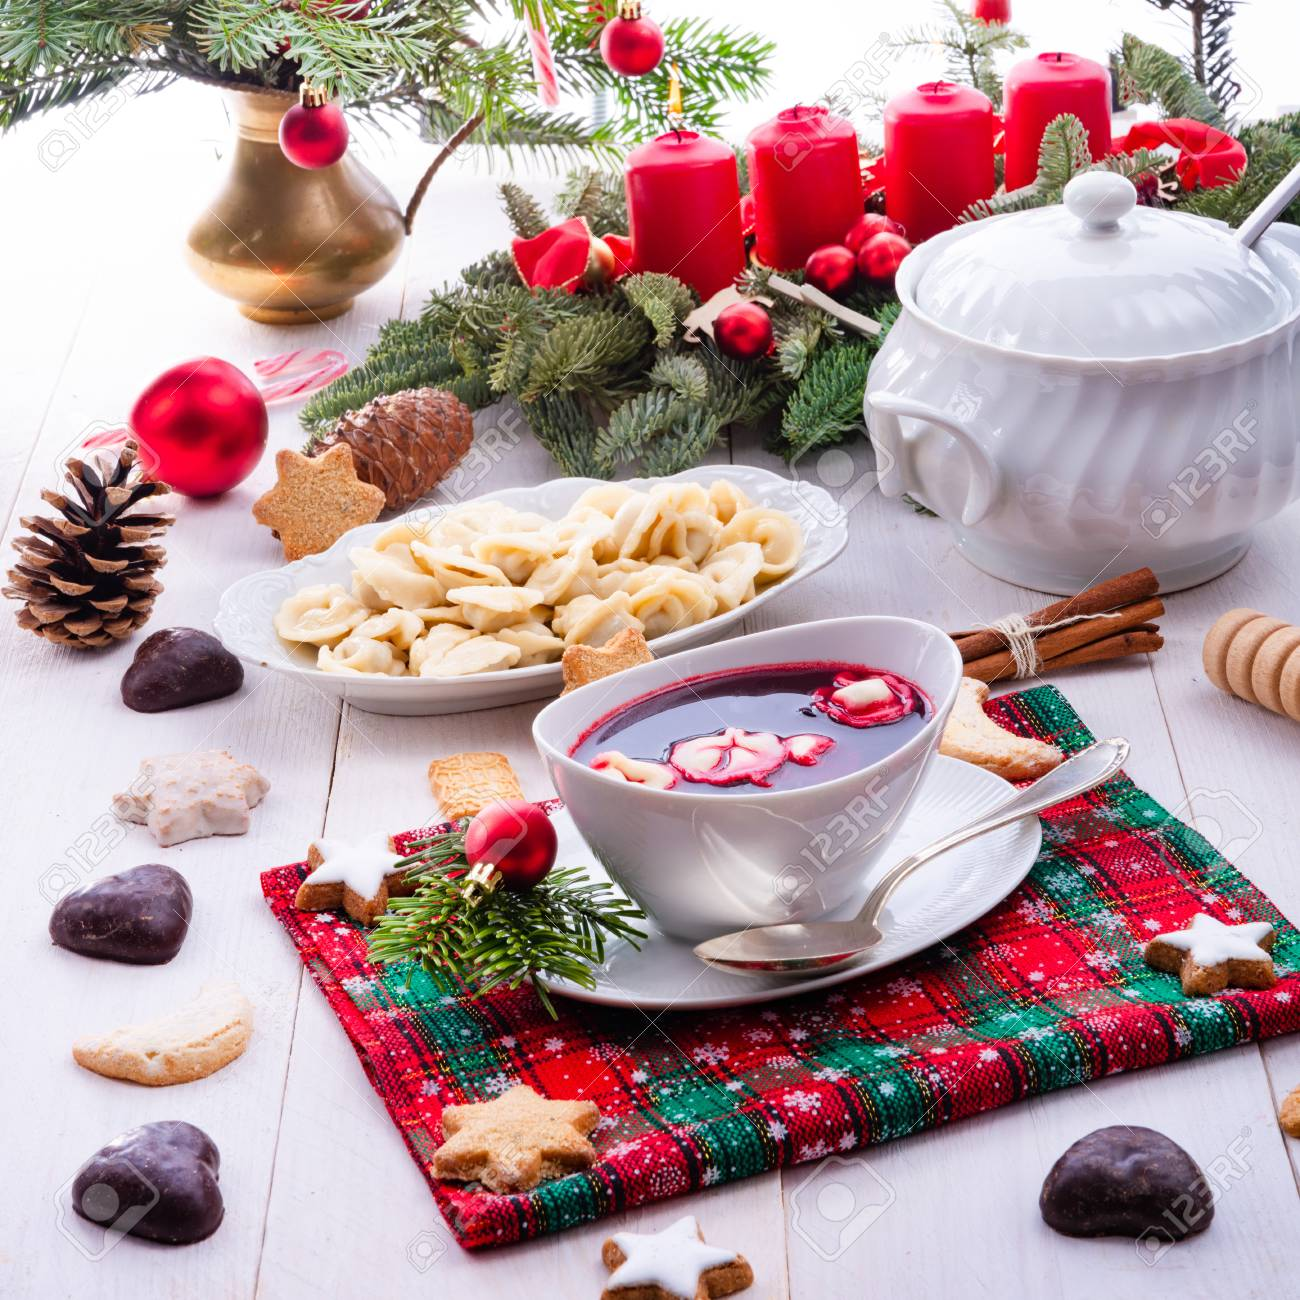 Christmas Soup.Red Barszcz With Uszka A Polish Christmas Soup